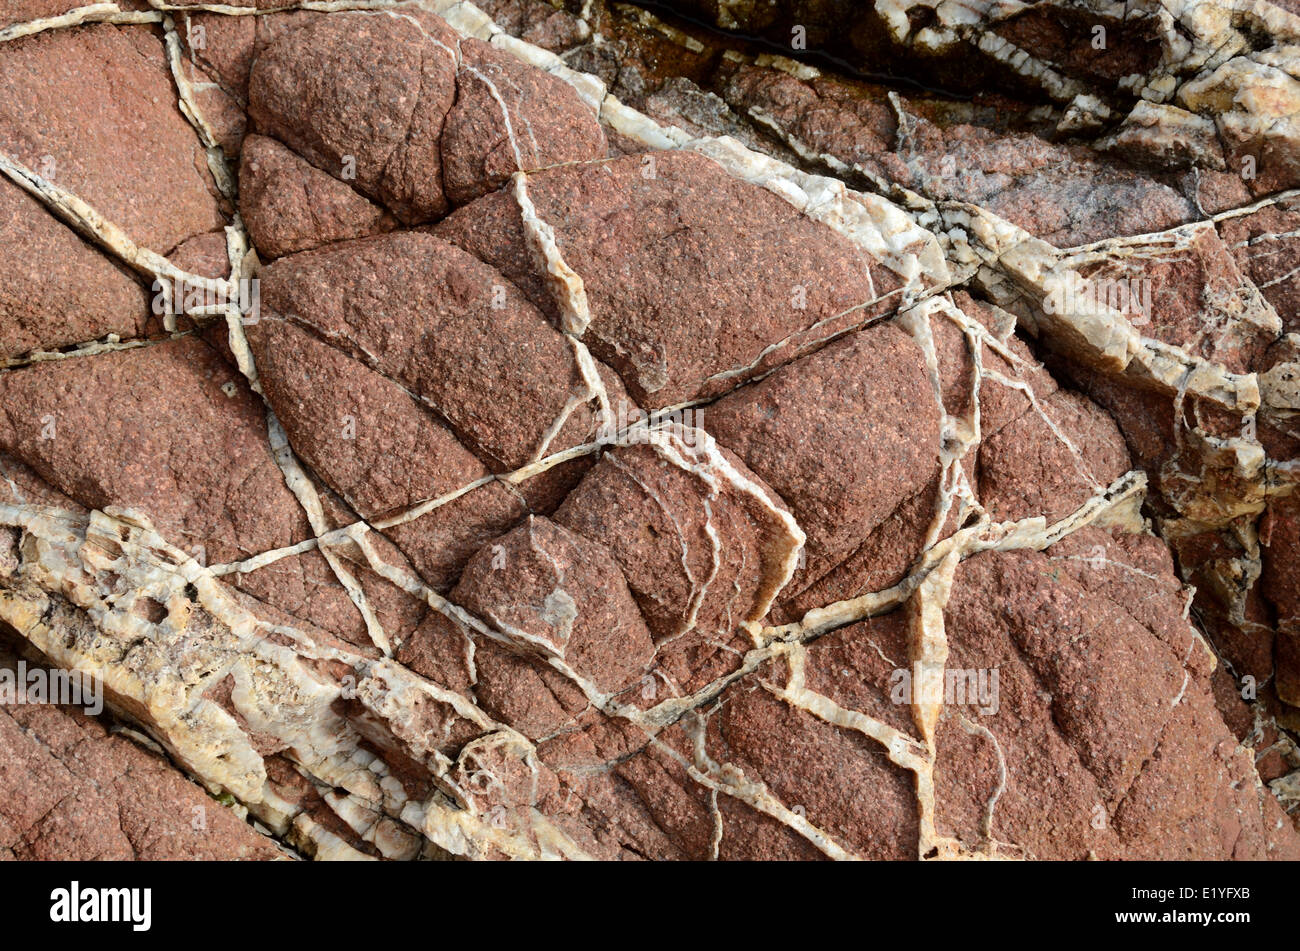 Quartz Veins in Rhyolite Volcanic Rock or Porphyry Granite Cap Dramont Saint Raphaël or Saint Raphael France - Stock Image